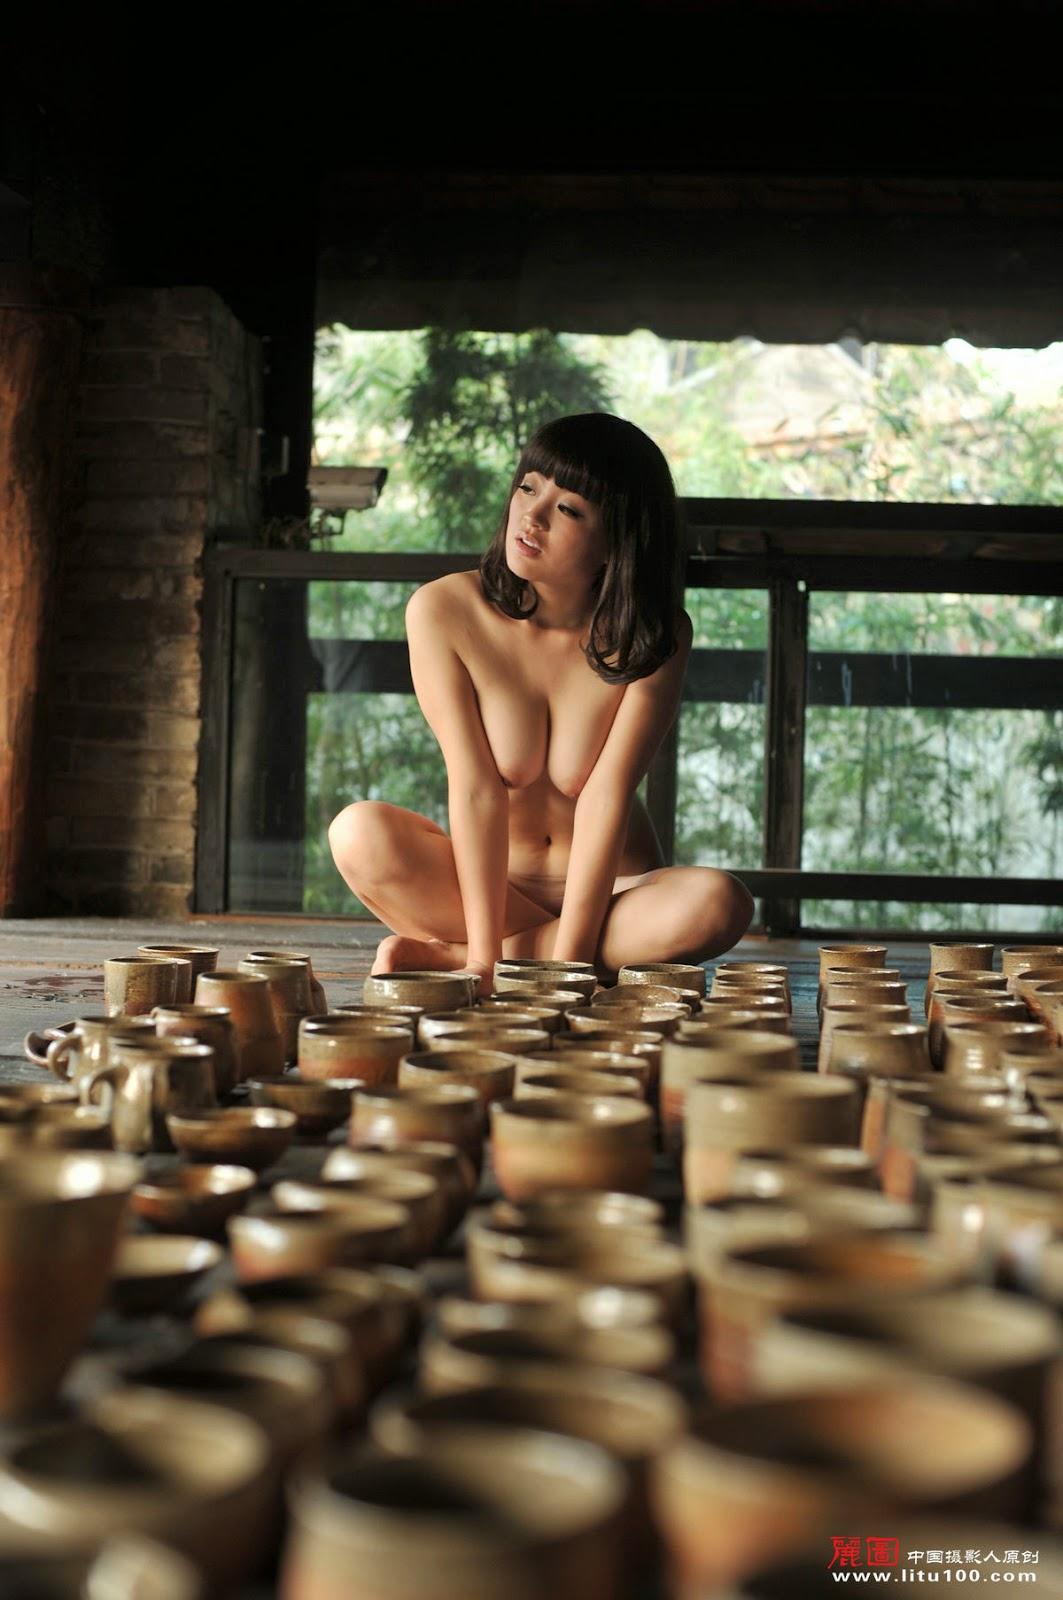 DSC 7168 - Chinese Nude Model Su Quan [Litu100]   18+ gallery photos